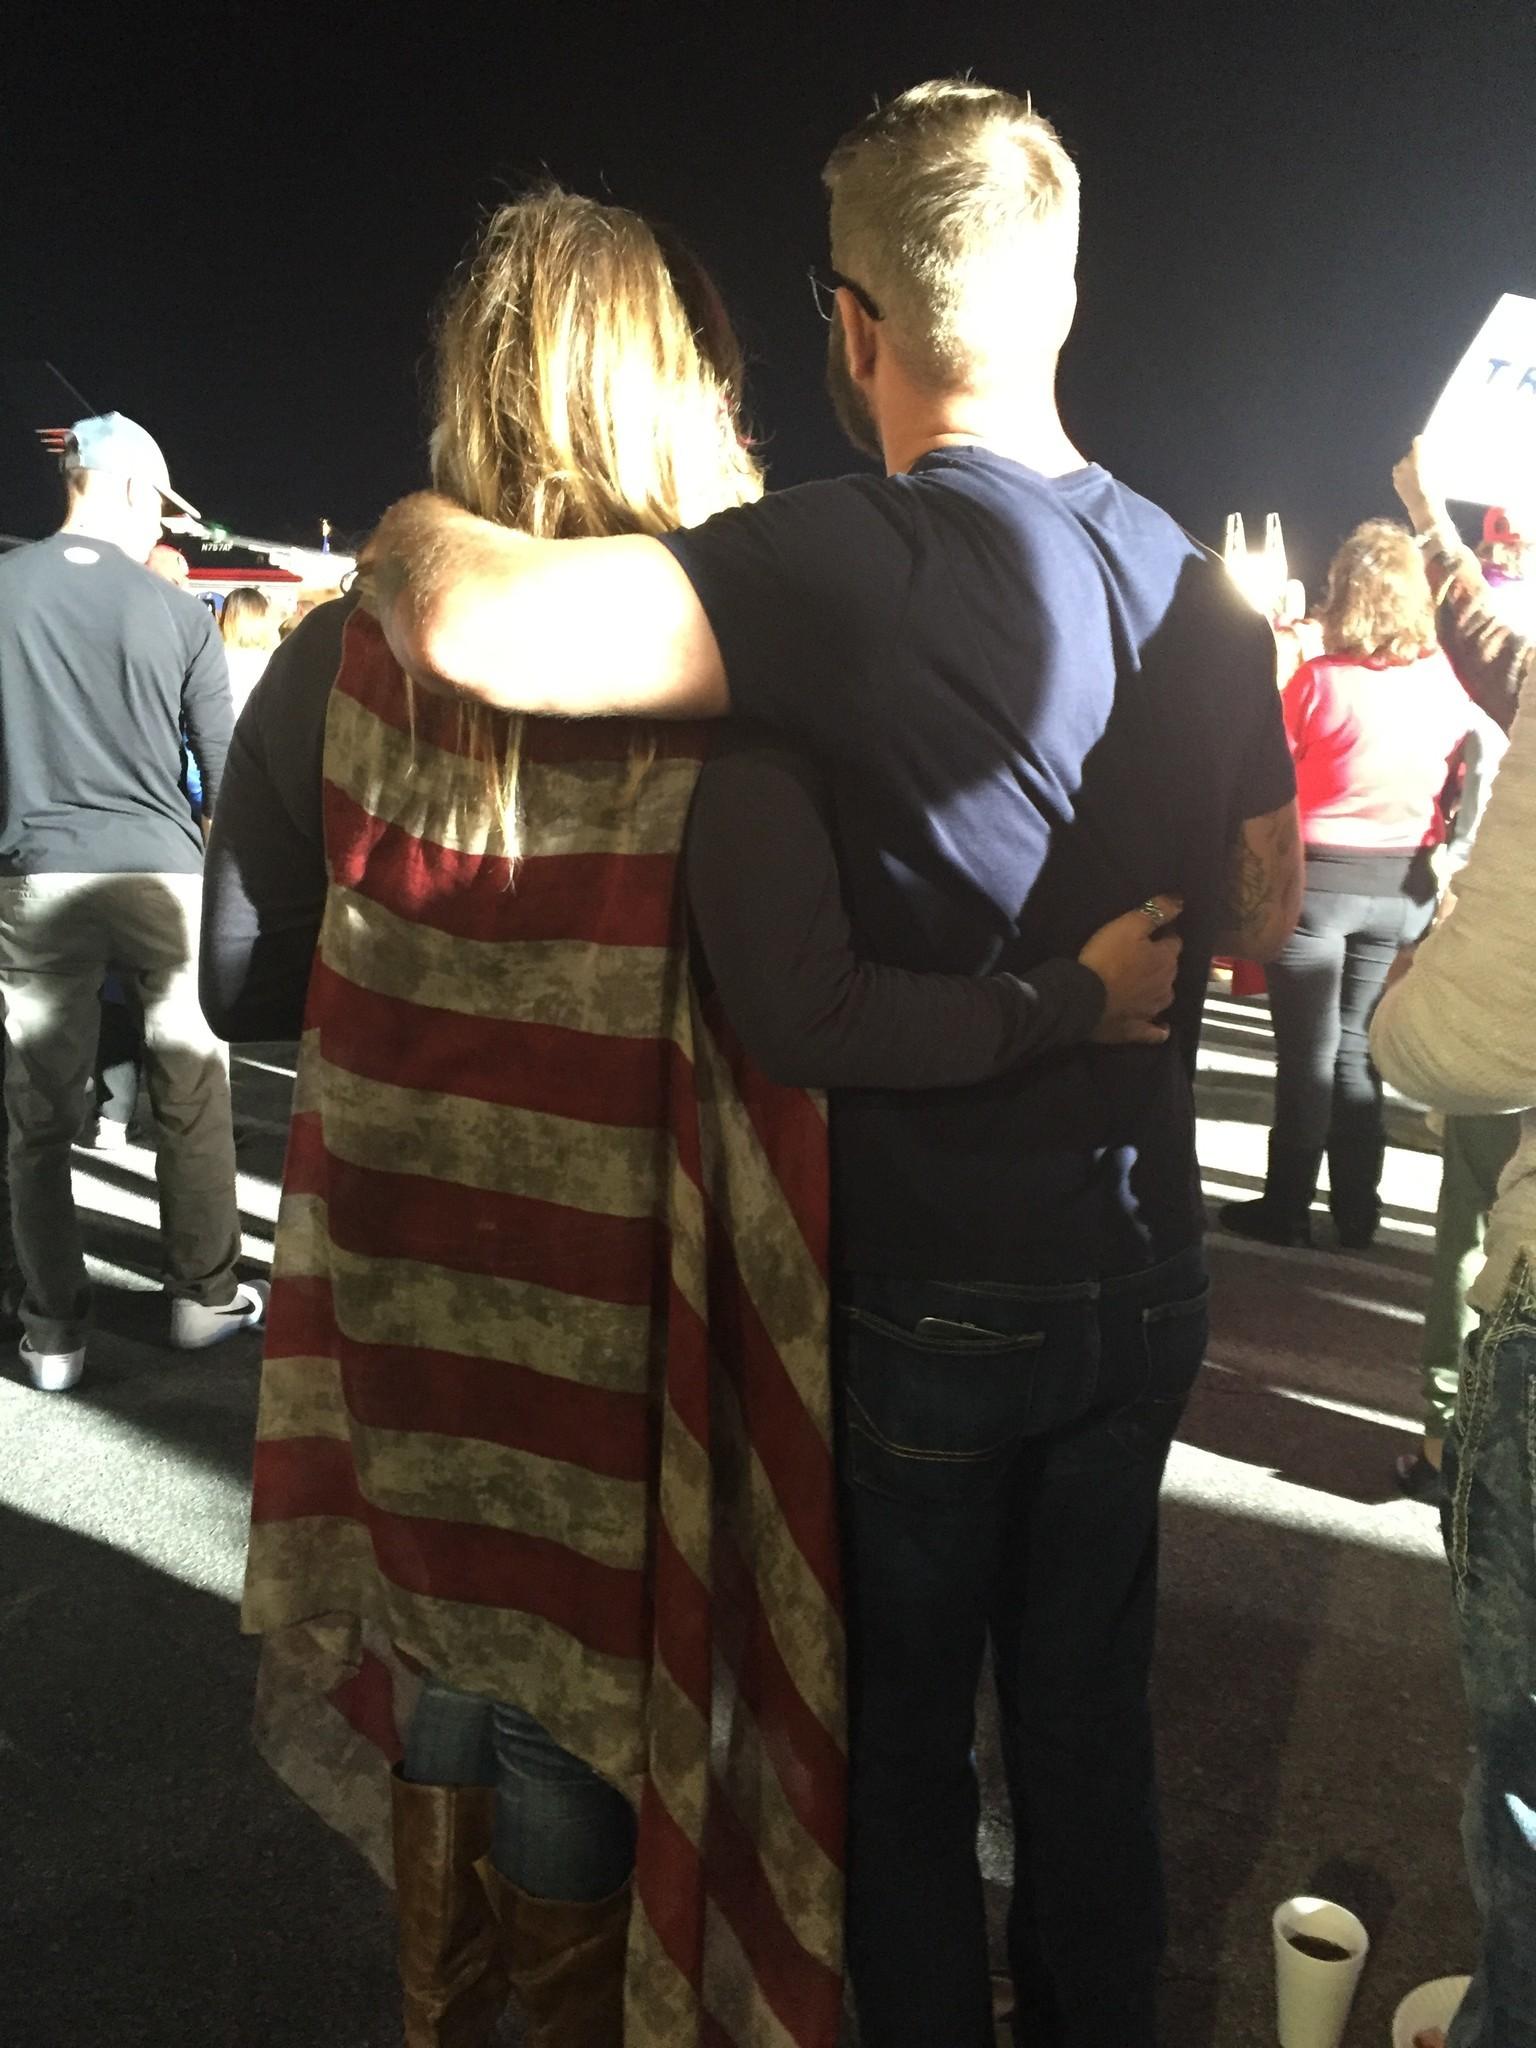 Shauna Godwin, left, wear a flag-themed sweater at a Trump rally in Kinston, N.C.